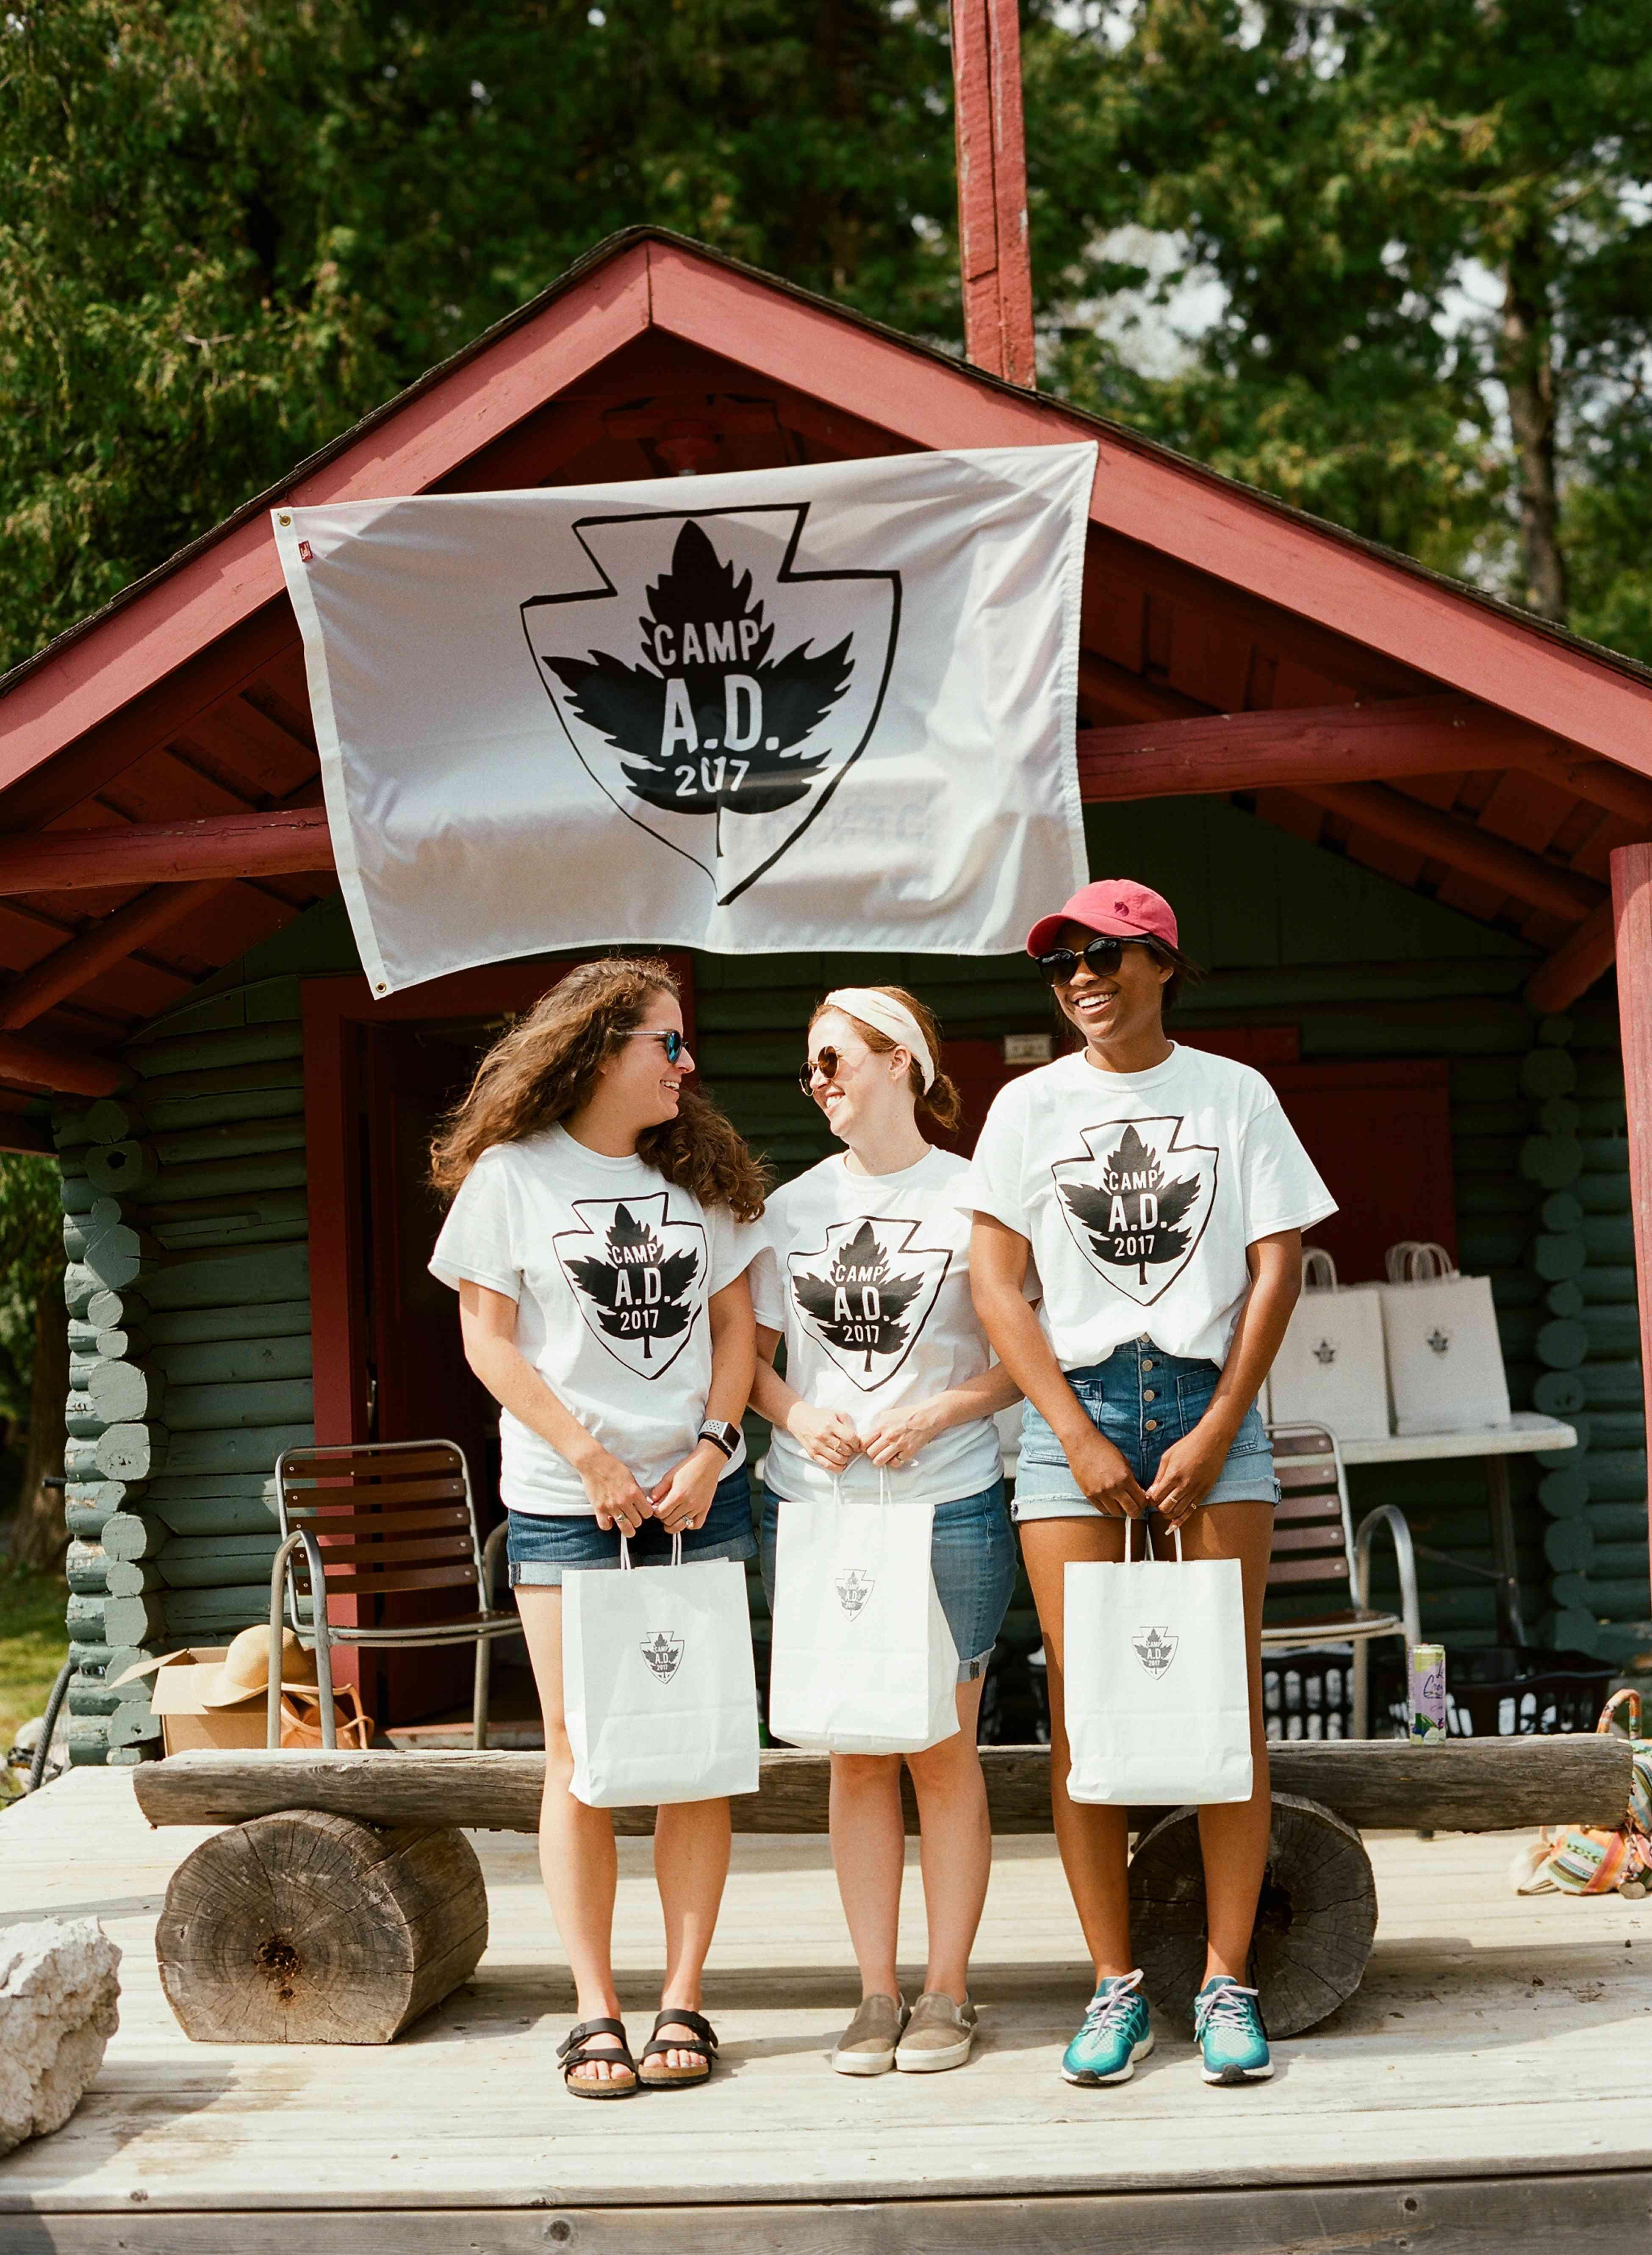 Camp goer guests